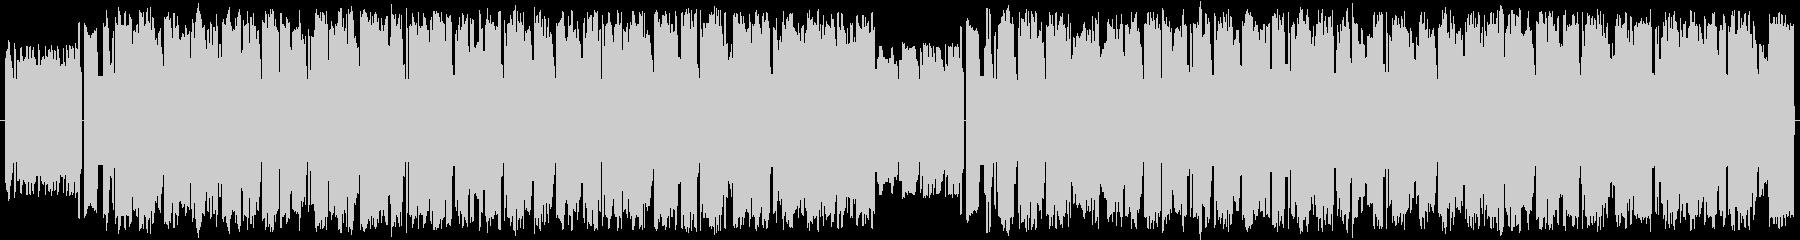 8bit風ルンバBGMの未再生の波形